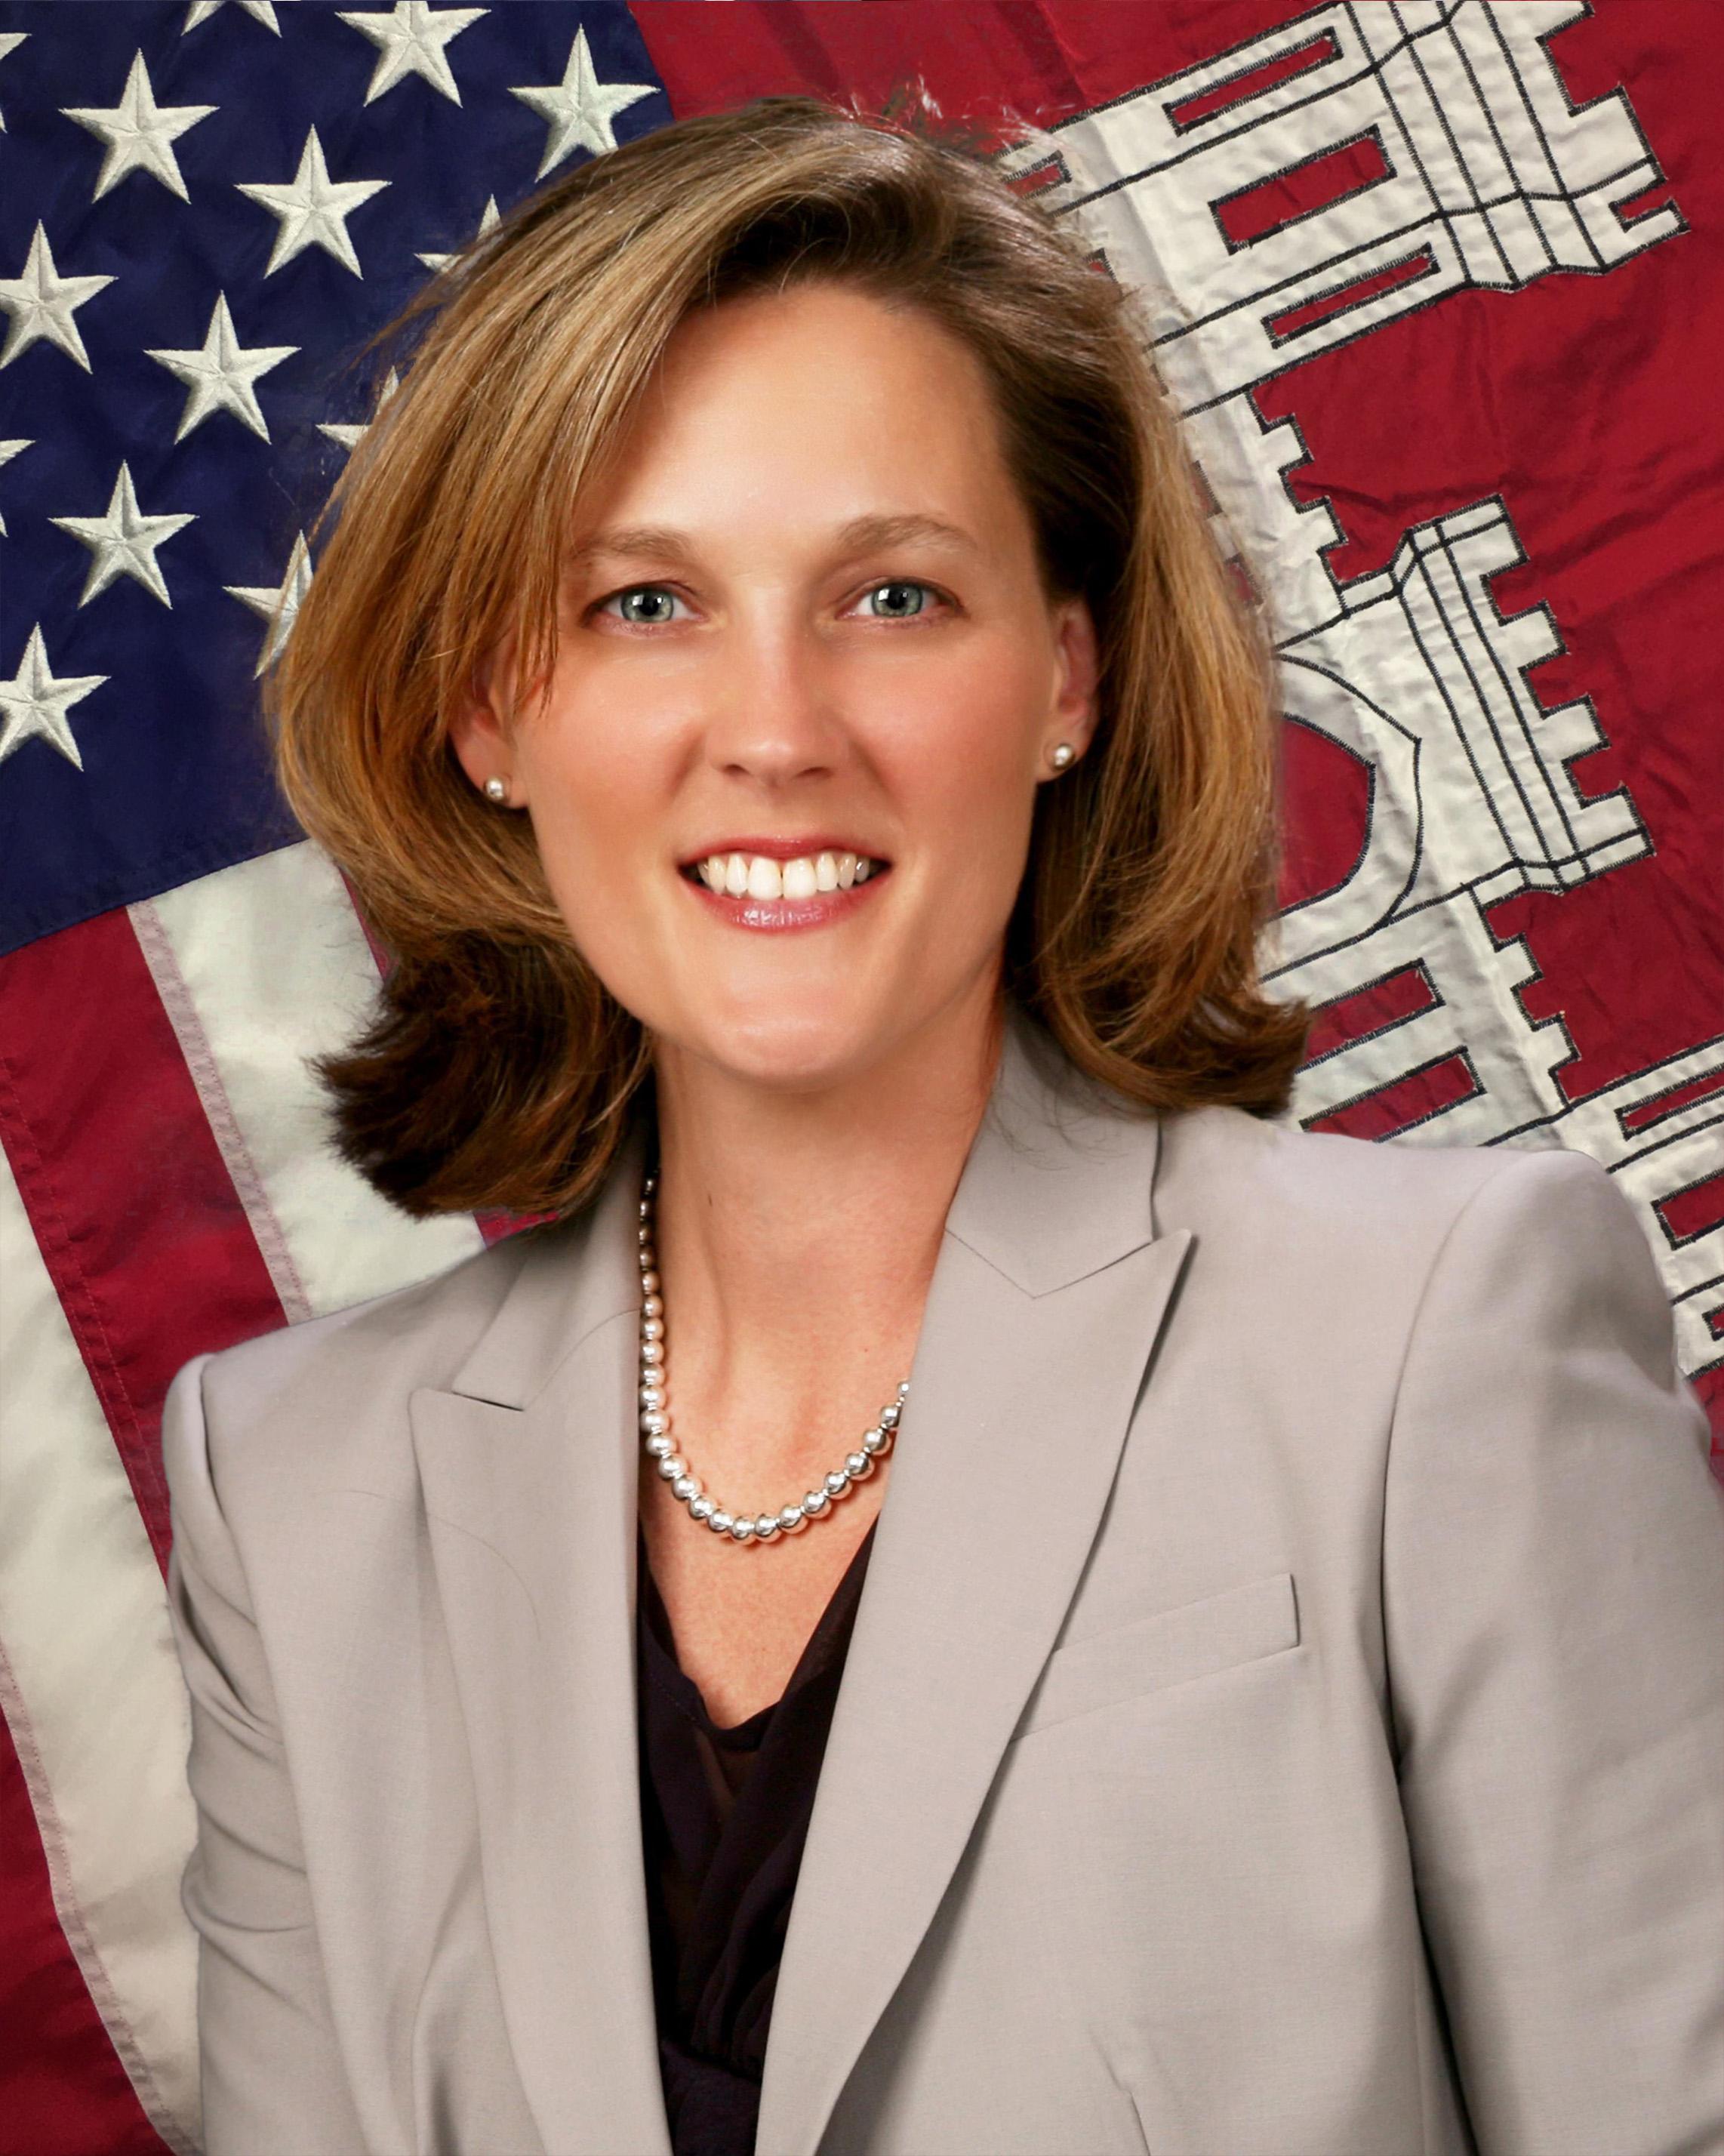 Ms. Tambour Eller - View Bio